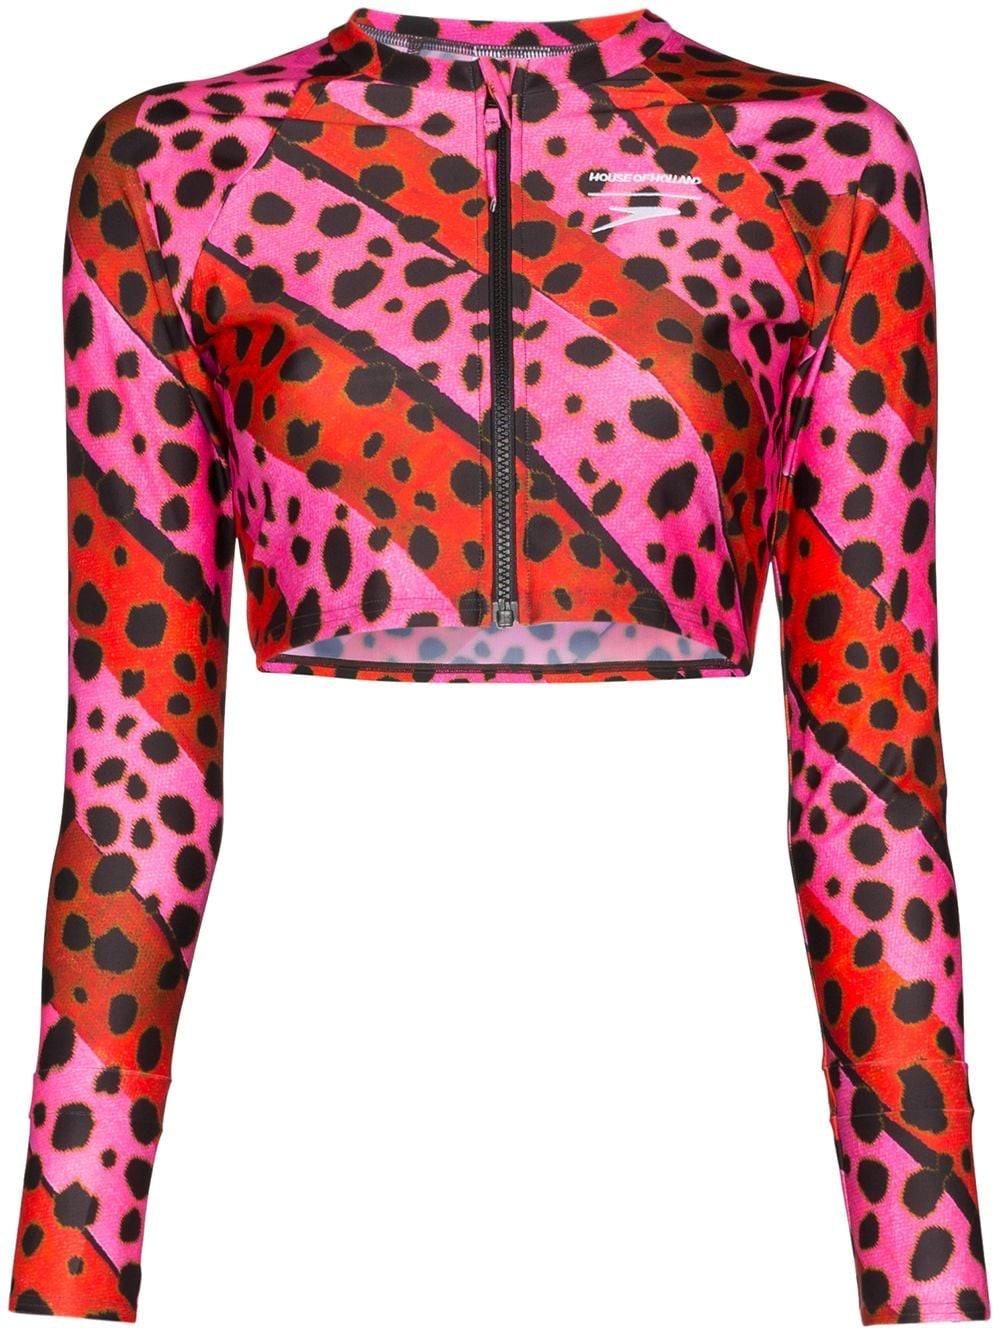 Leopard Print Striped Bikini Top